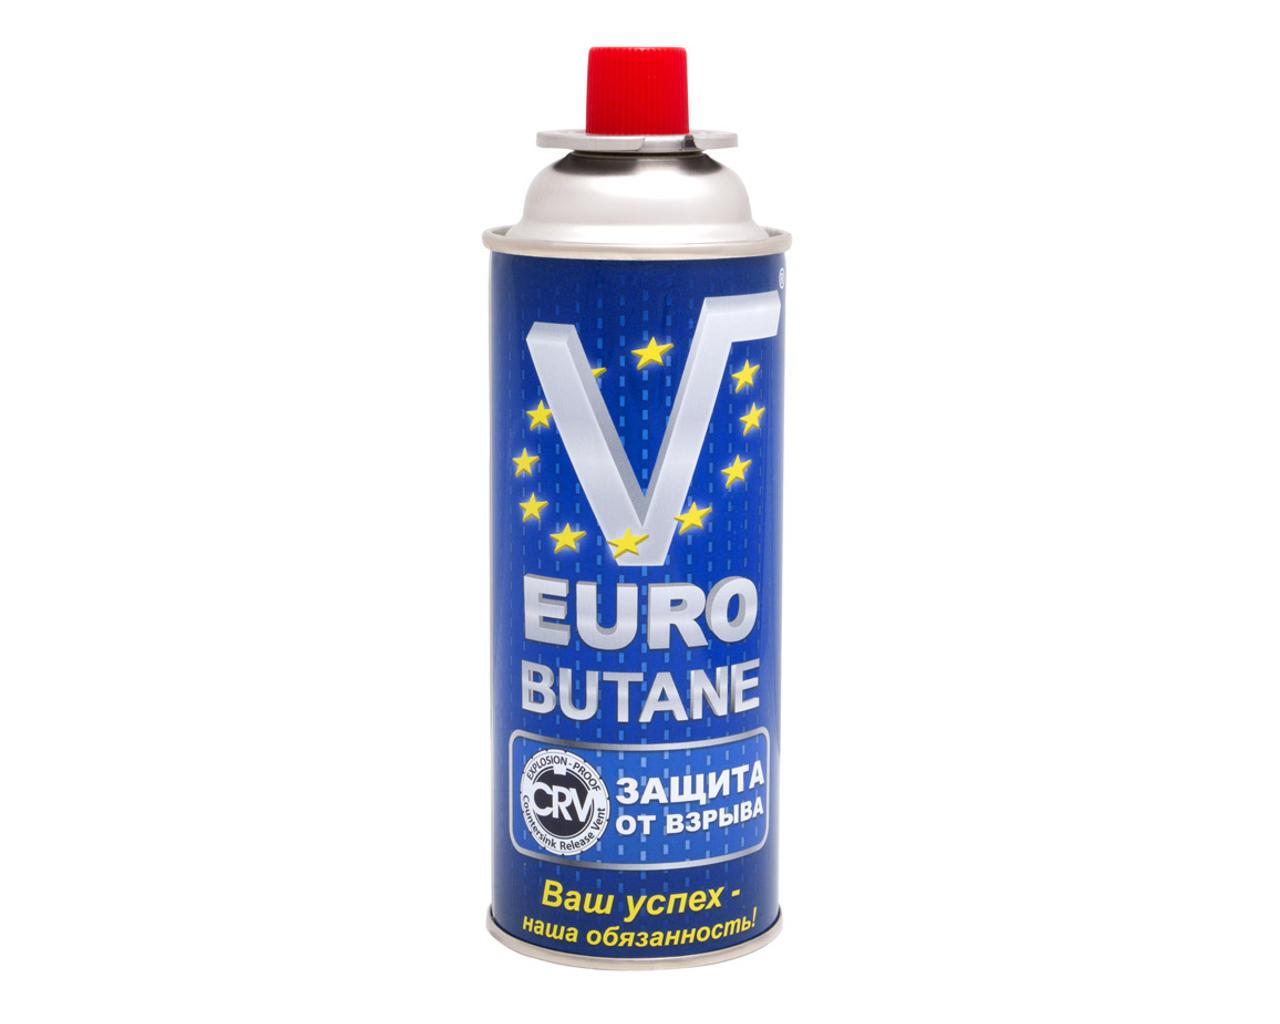 Газовый баллон Euro Butane 227г с системой СRV Корея